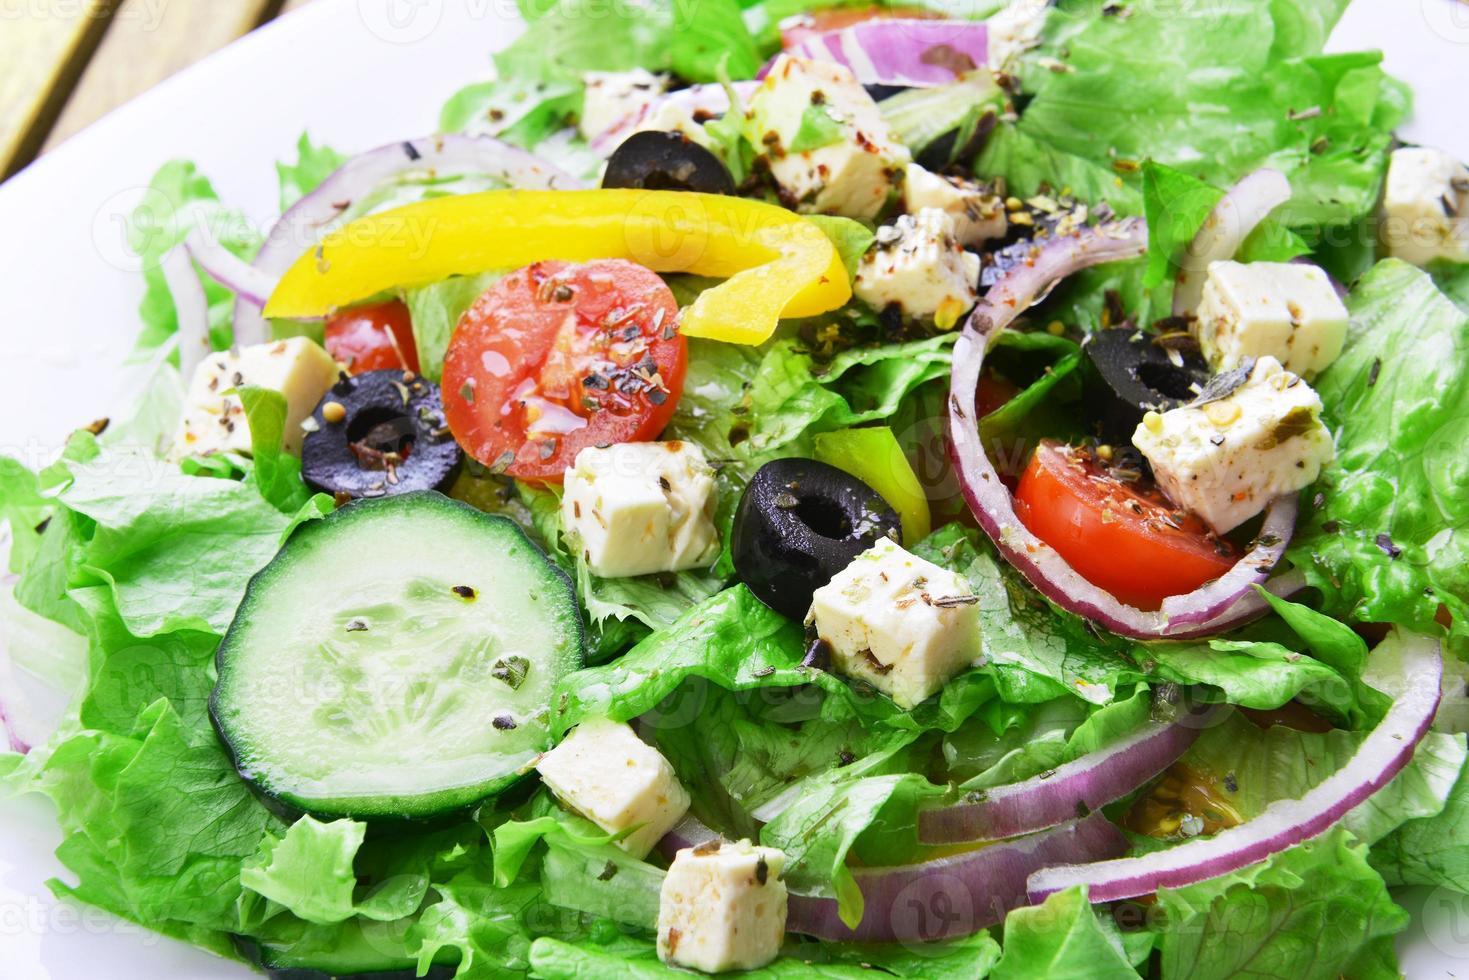 salada com legumes frescos foto